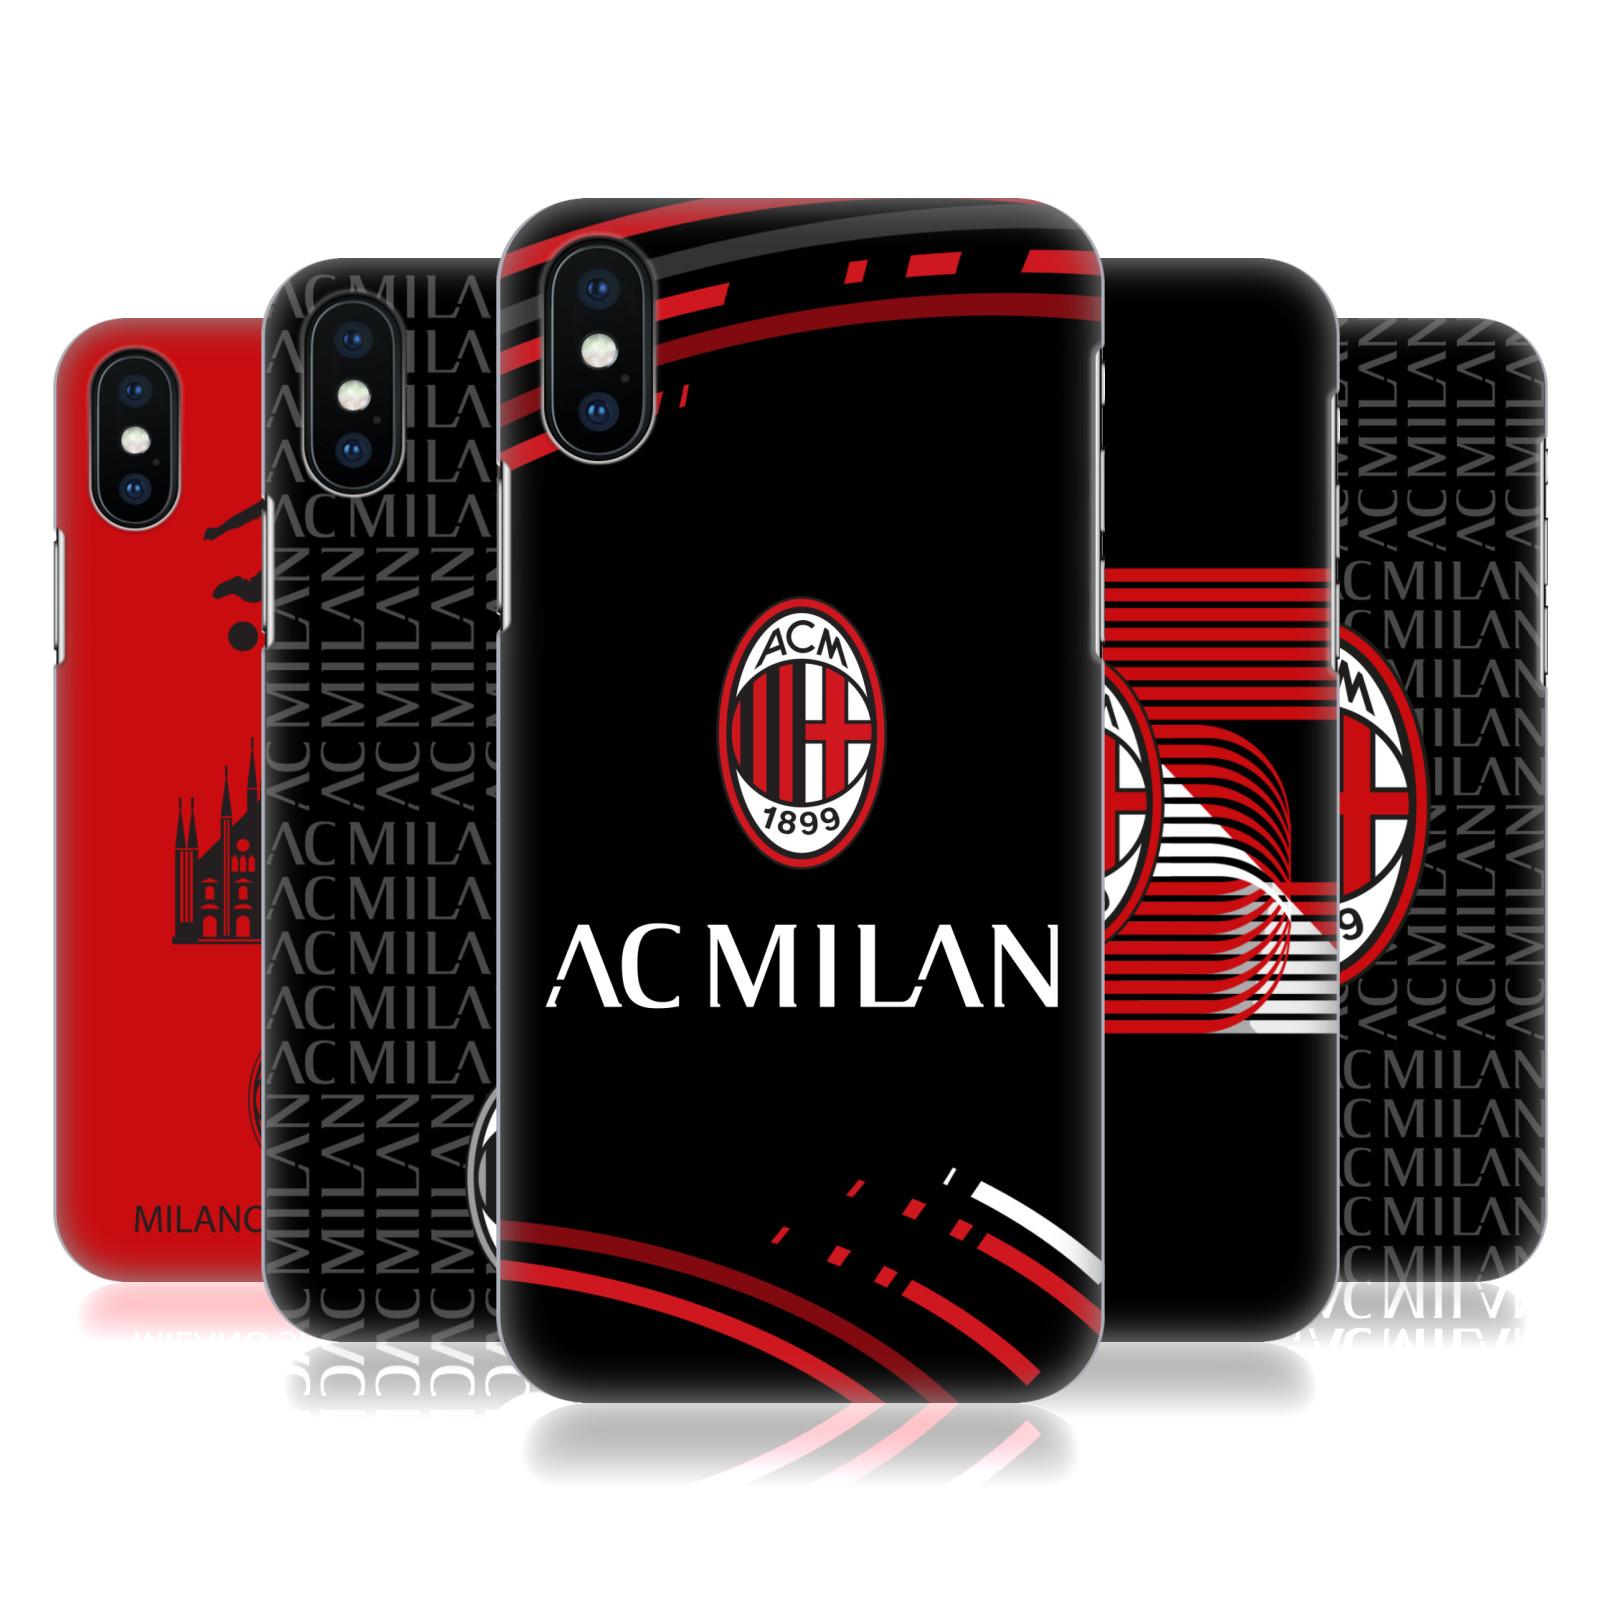 AC Milan 2018/19 Crest Patterns